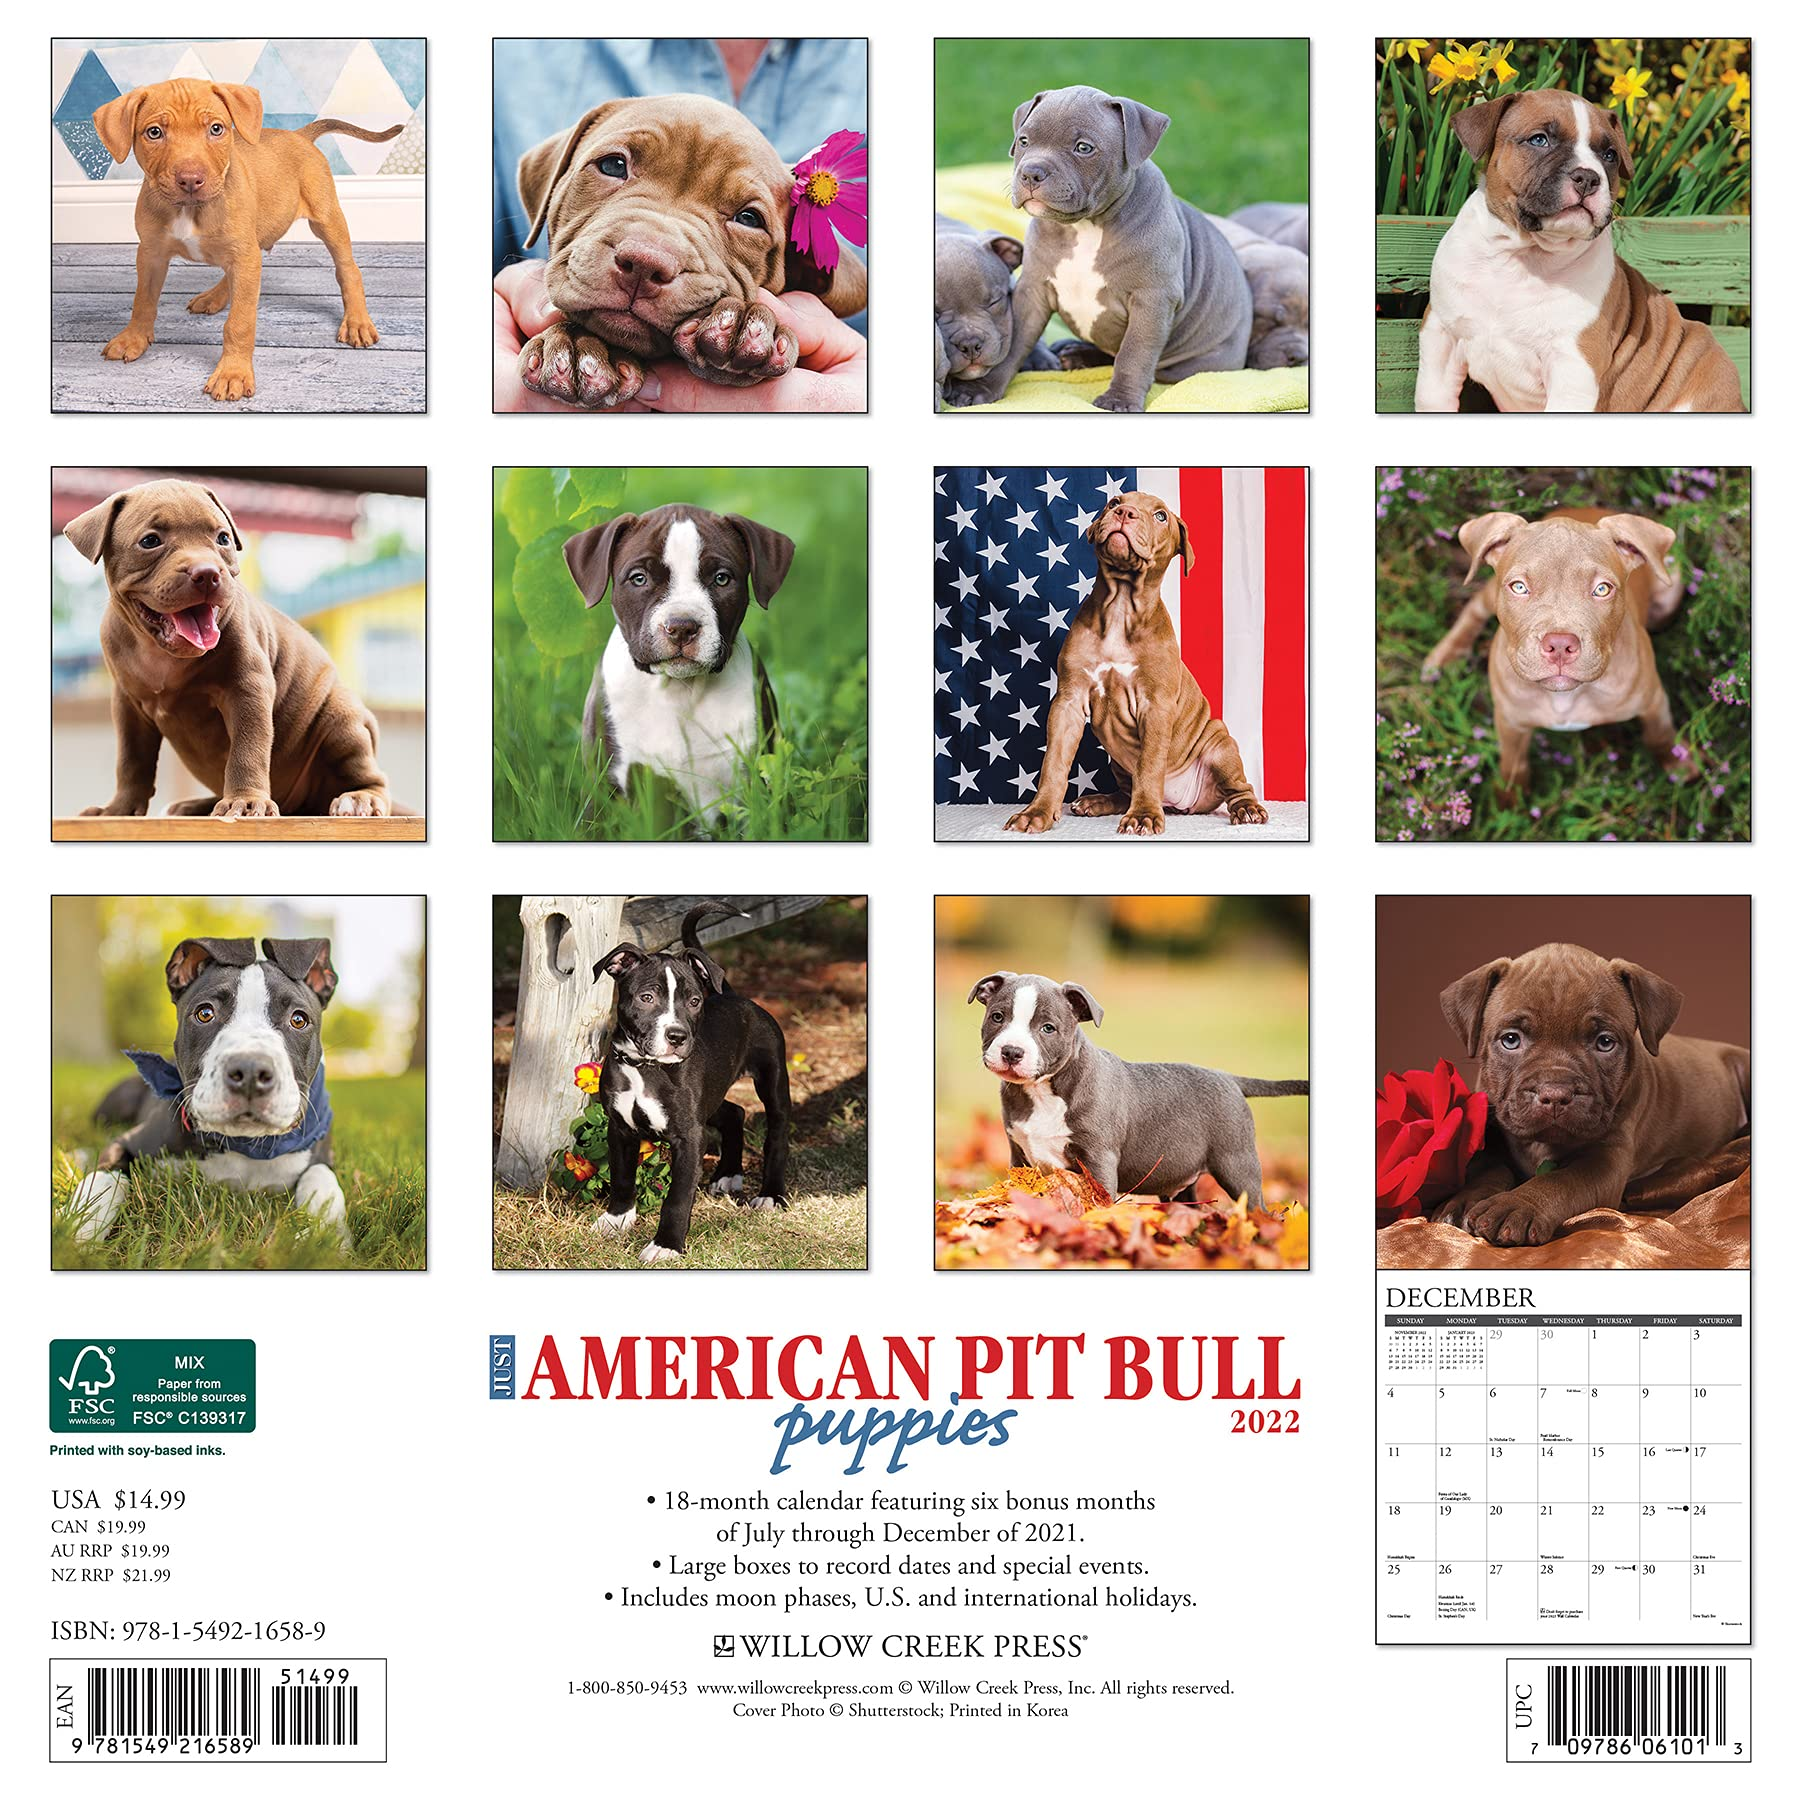 american pit bull puppies 2022 calendar